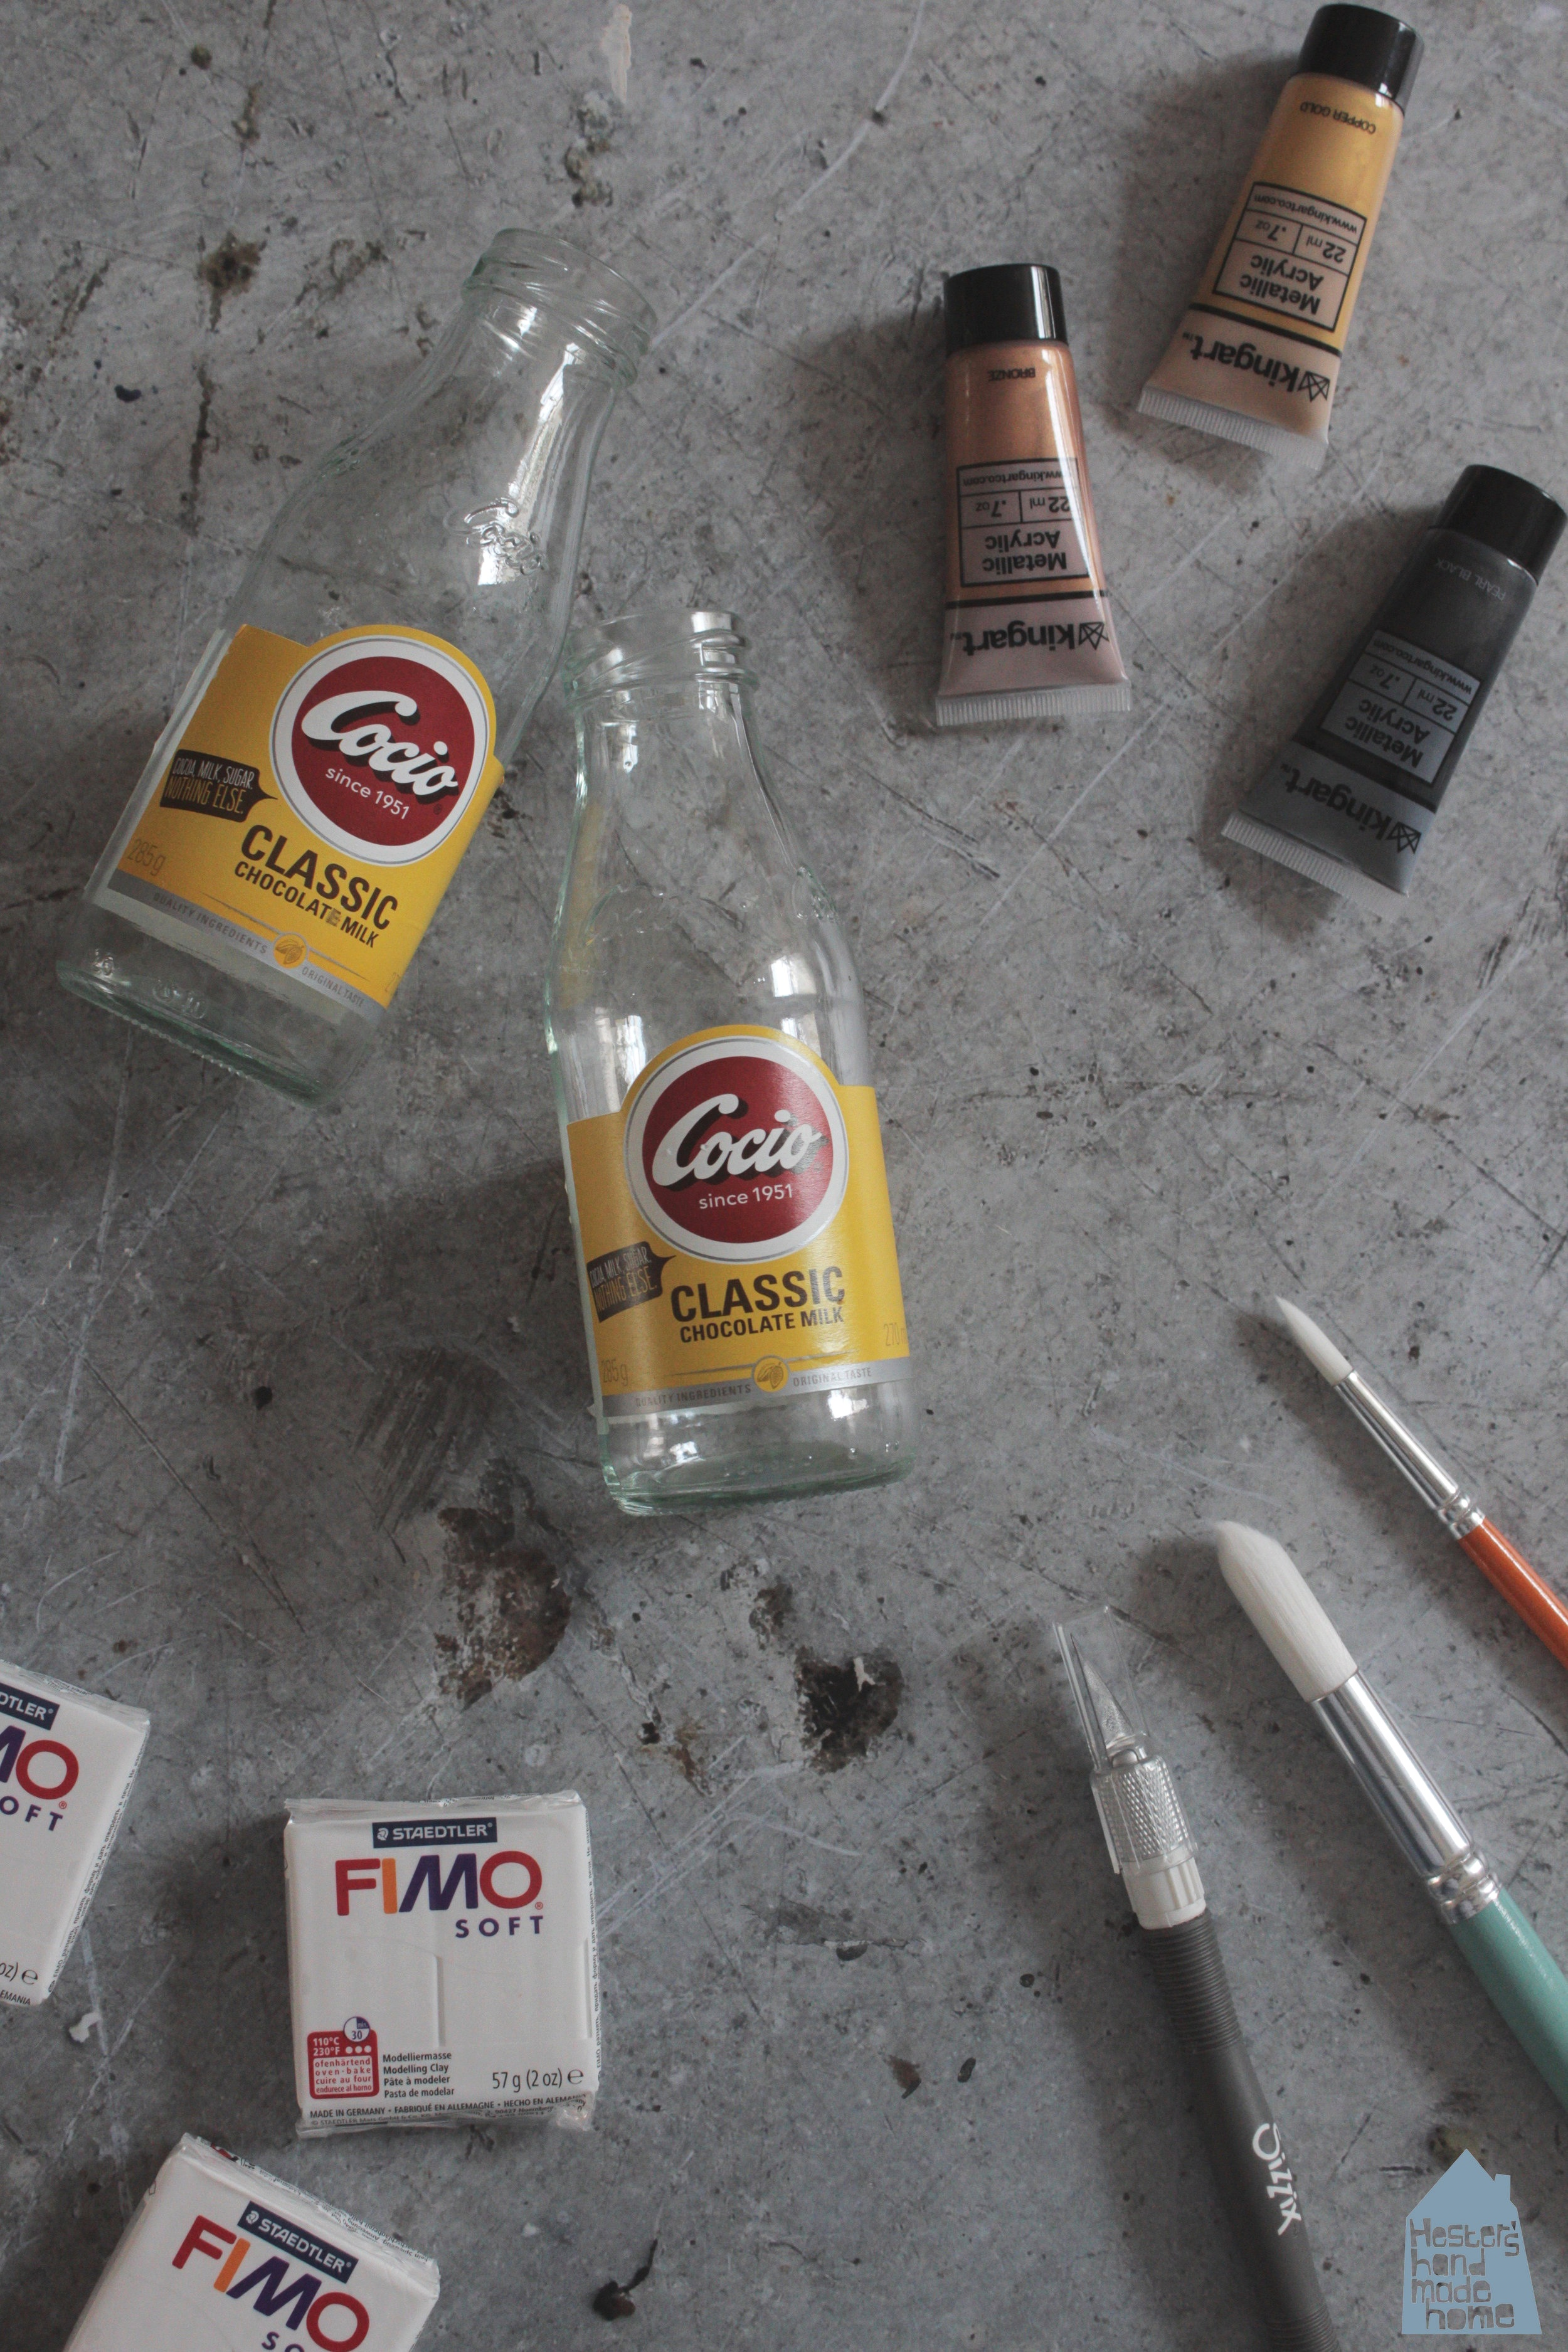 FIMO+clay+vase+hack+by+www.hestershandmadehome.jpg